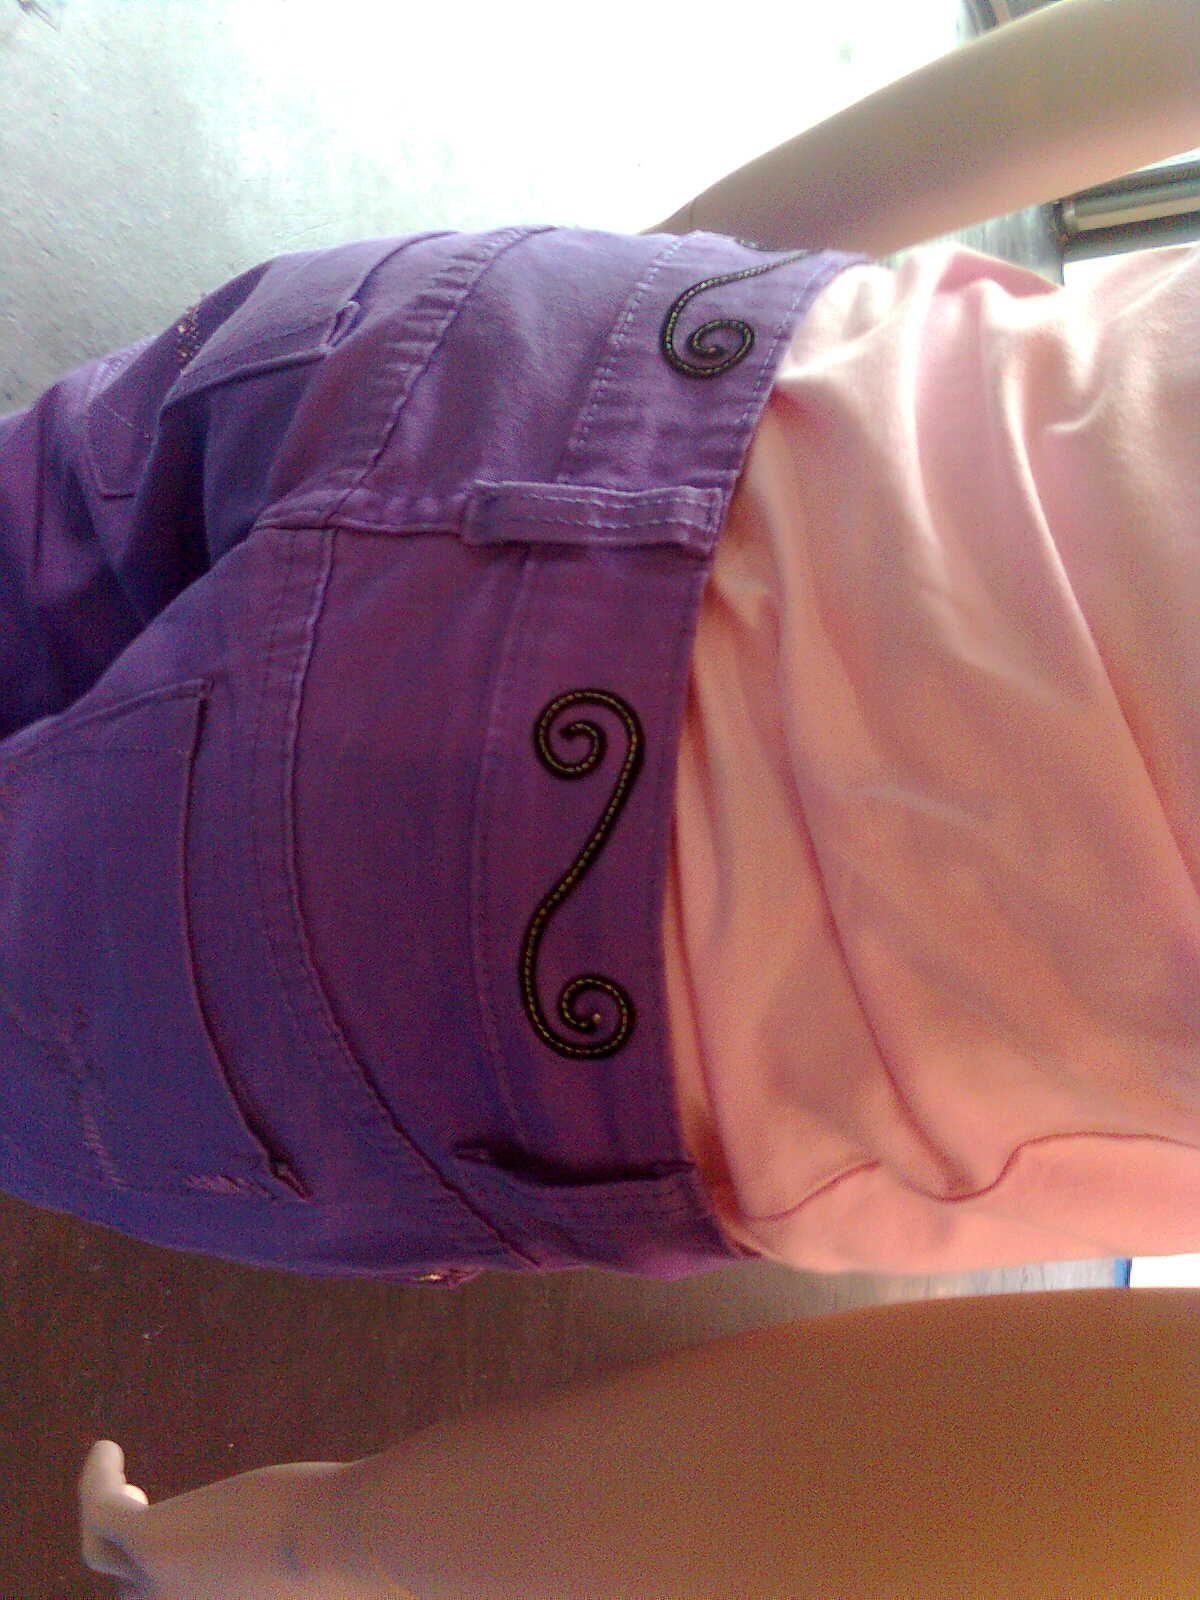 #Laser decoration on woman jeans